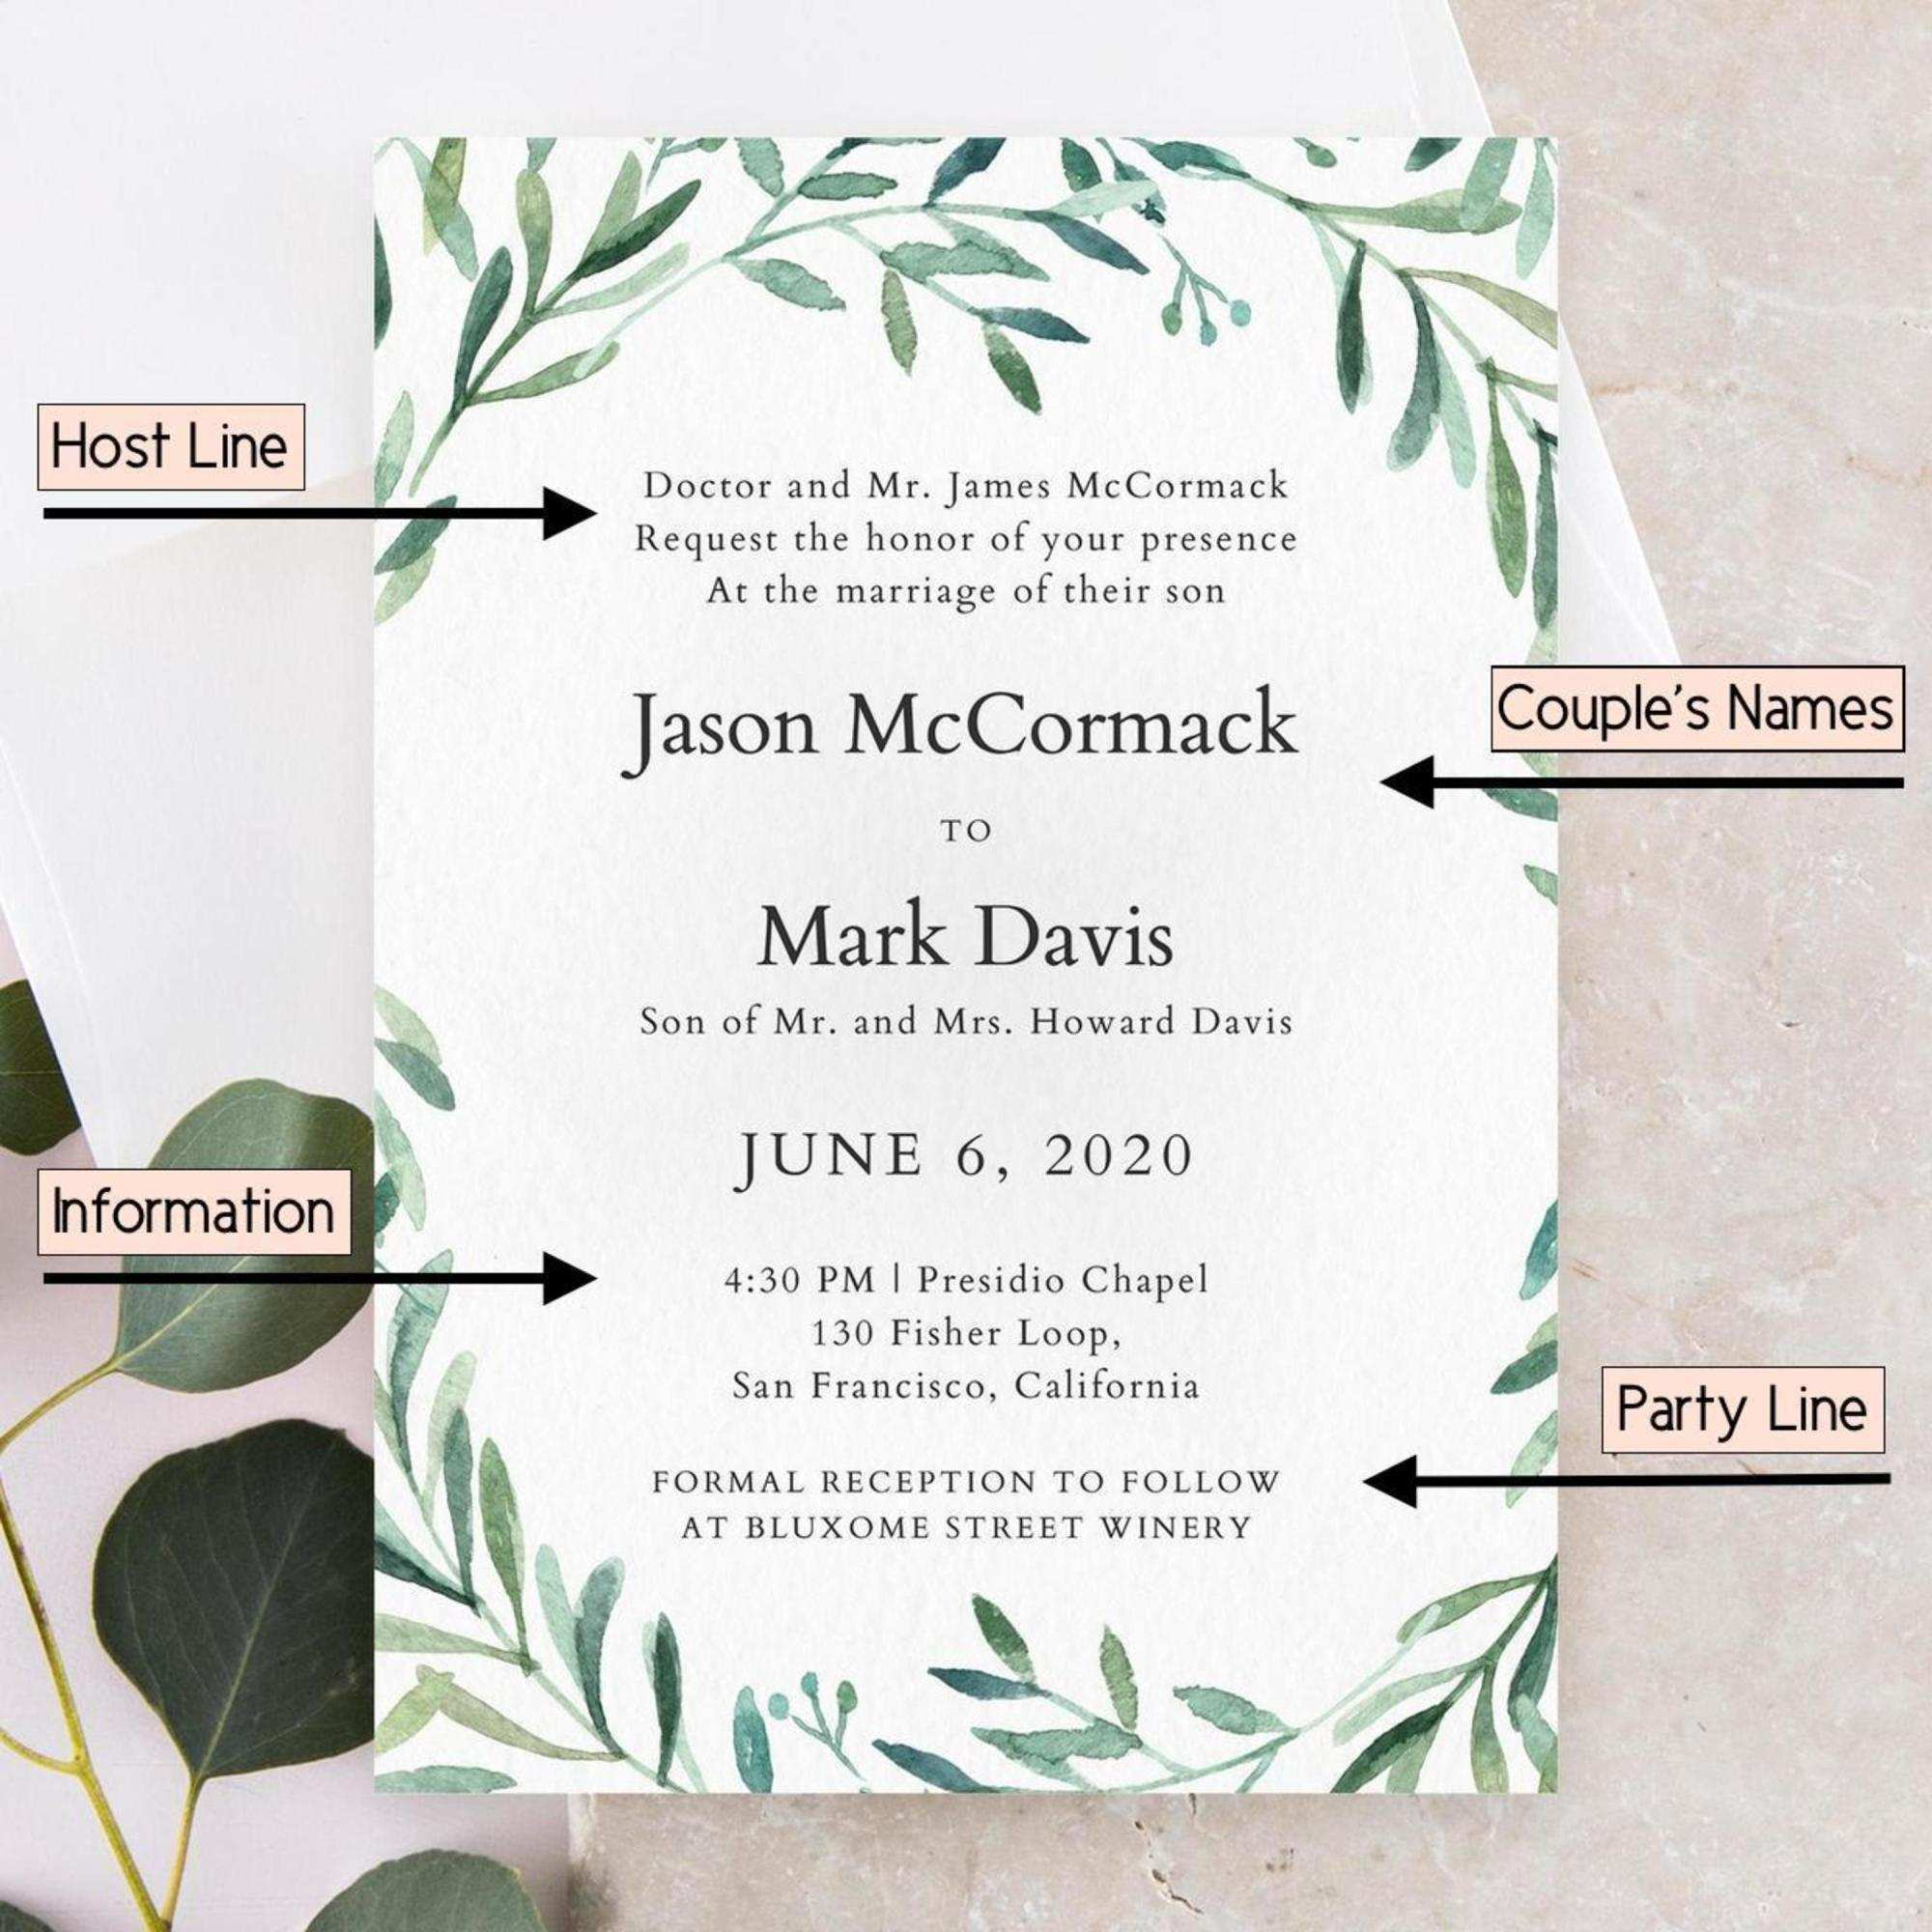 22 Create Wedding Invitation Template In Word in Photoshop by Wedding Invitation Template In Word